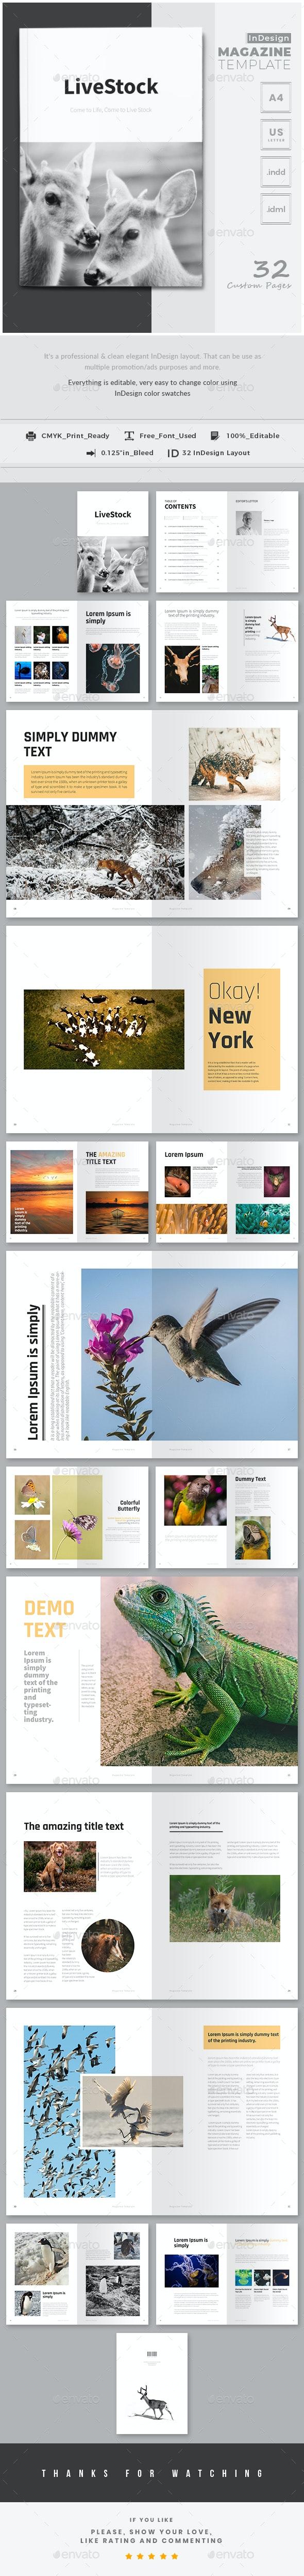 InDesign Magazine Templates - Magazines Print Templates